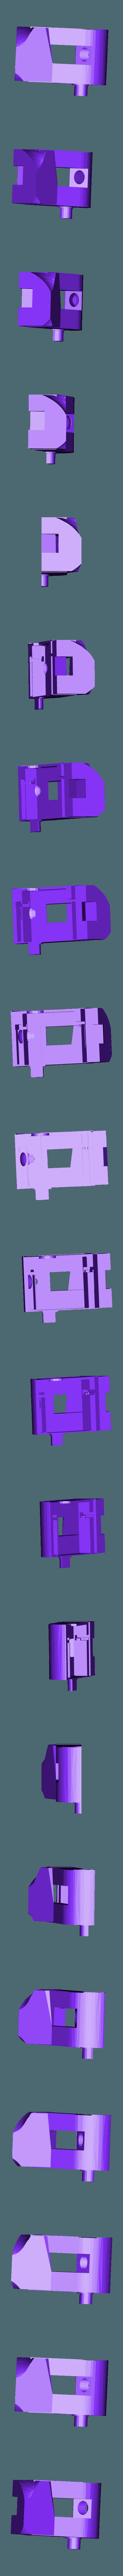 gadgets bicep pt2 left 2print.stl Download free STL file GADGET the robotic Gremlin • 3D printing object, atarka3